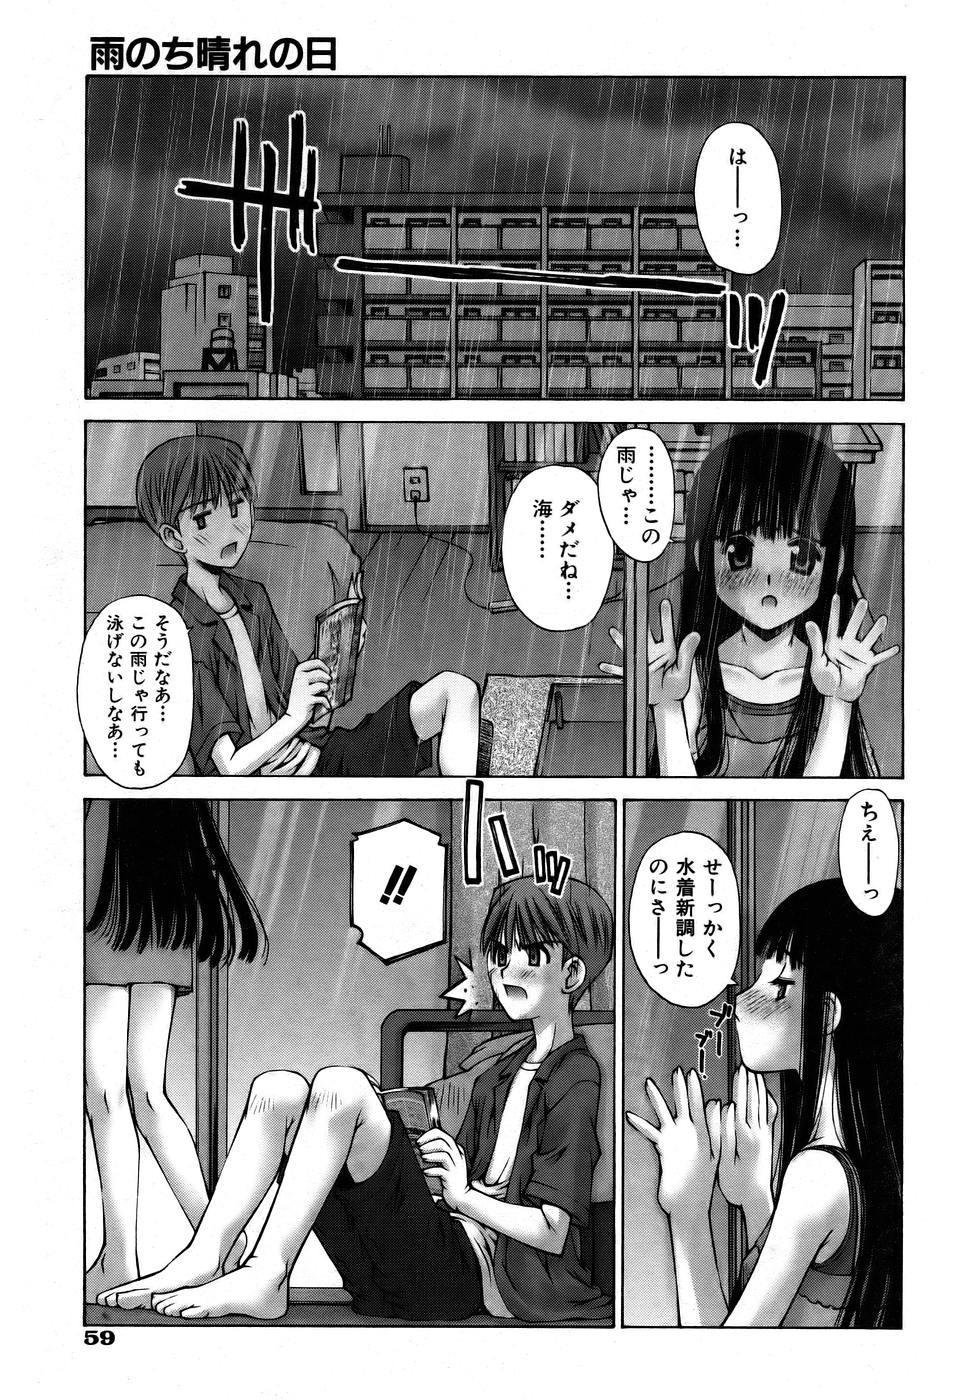 COMIC AUN 2005-12 Vol. 115 58